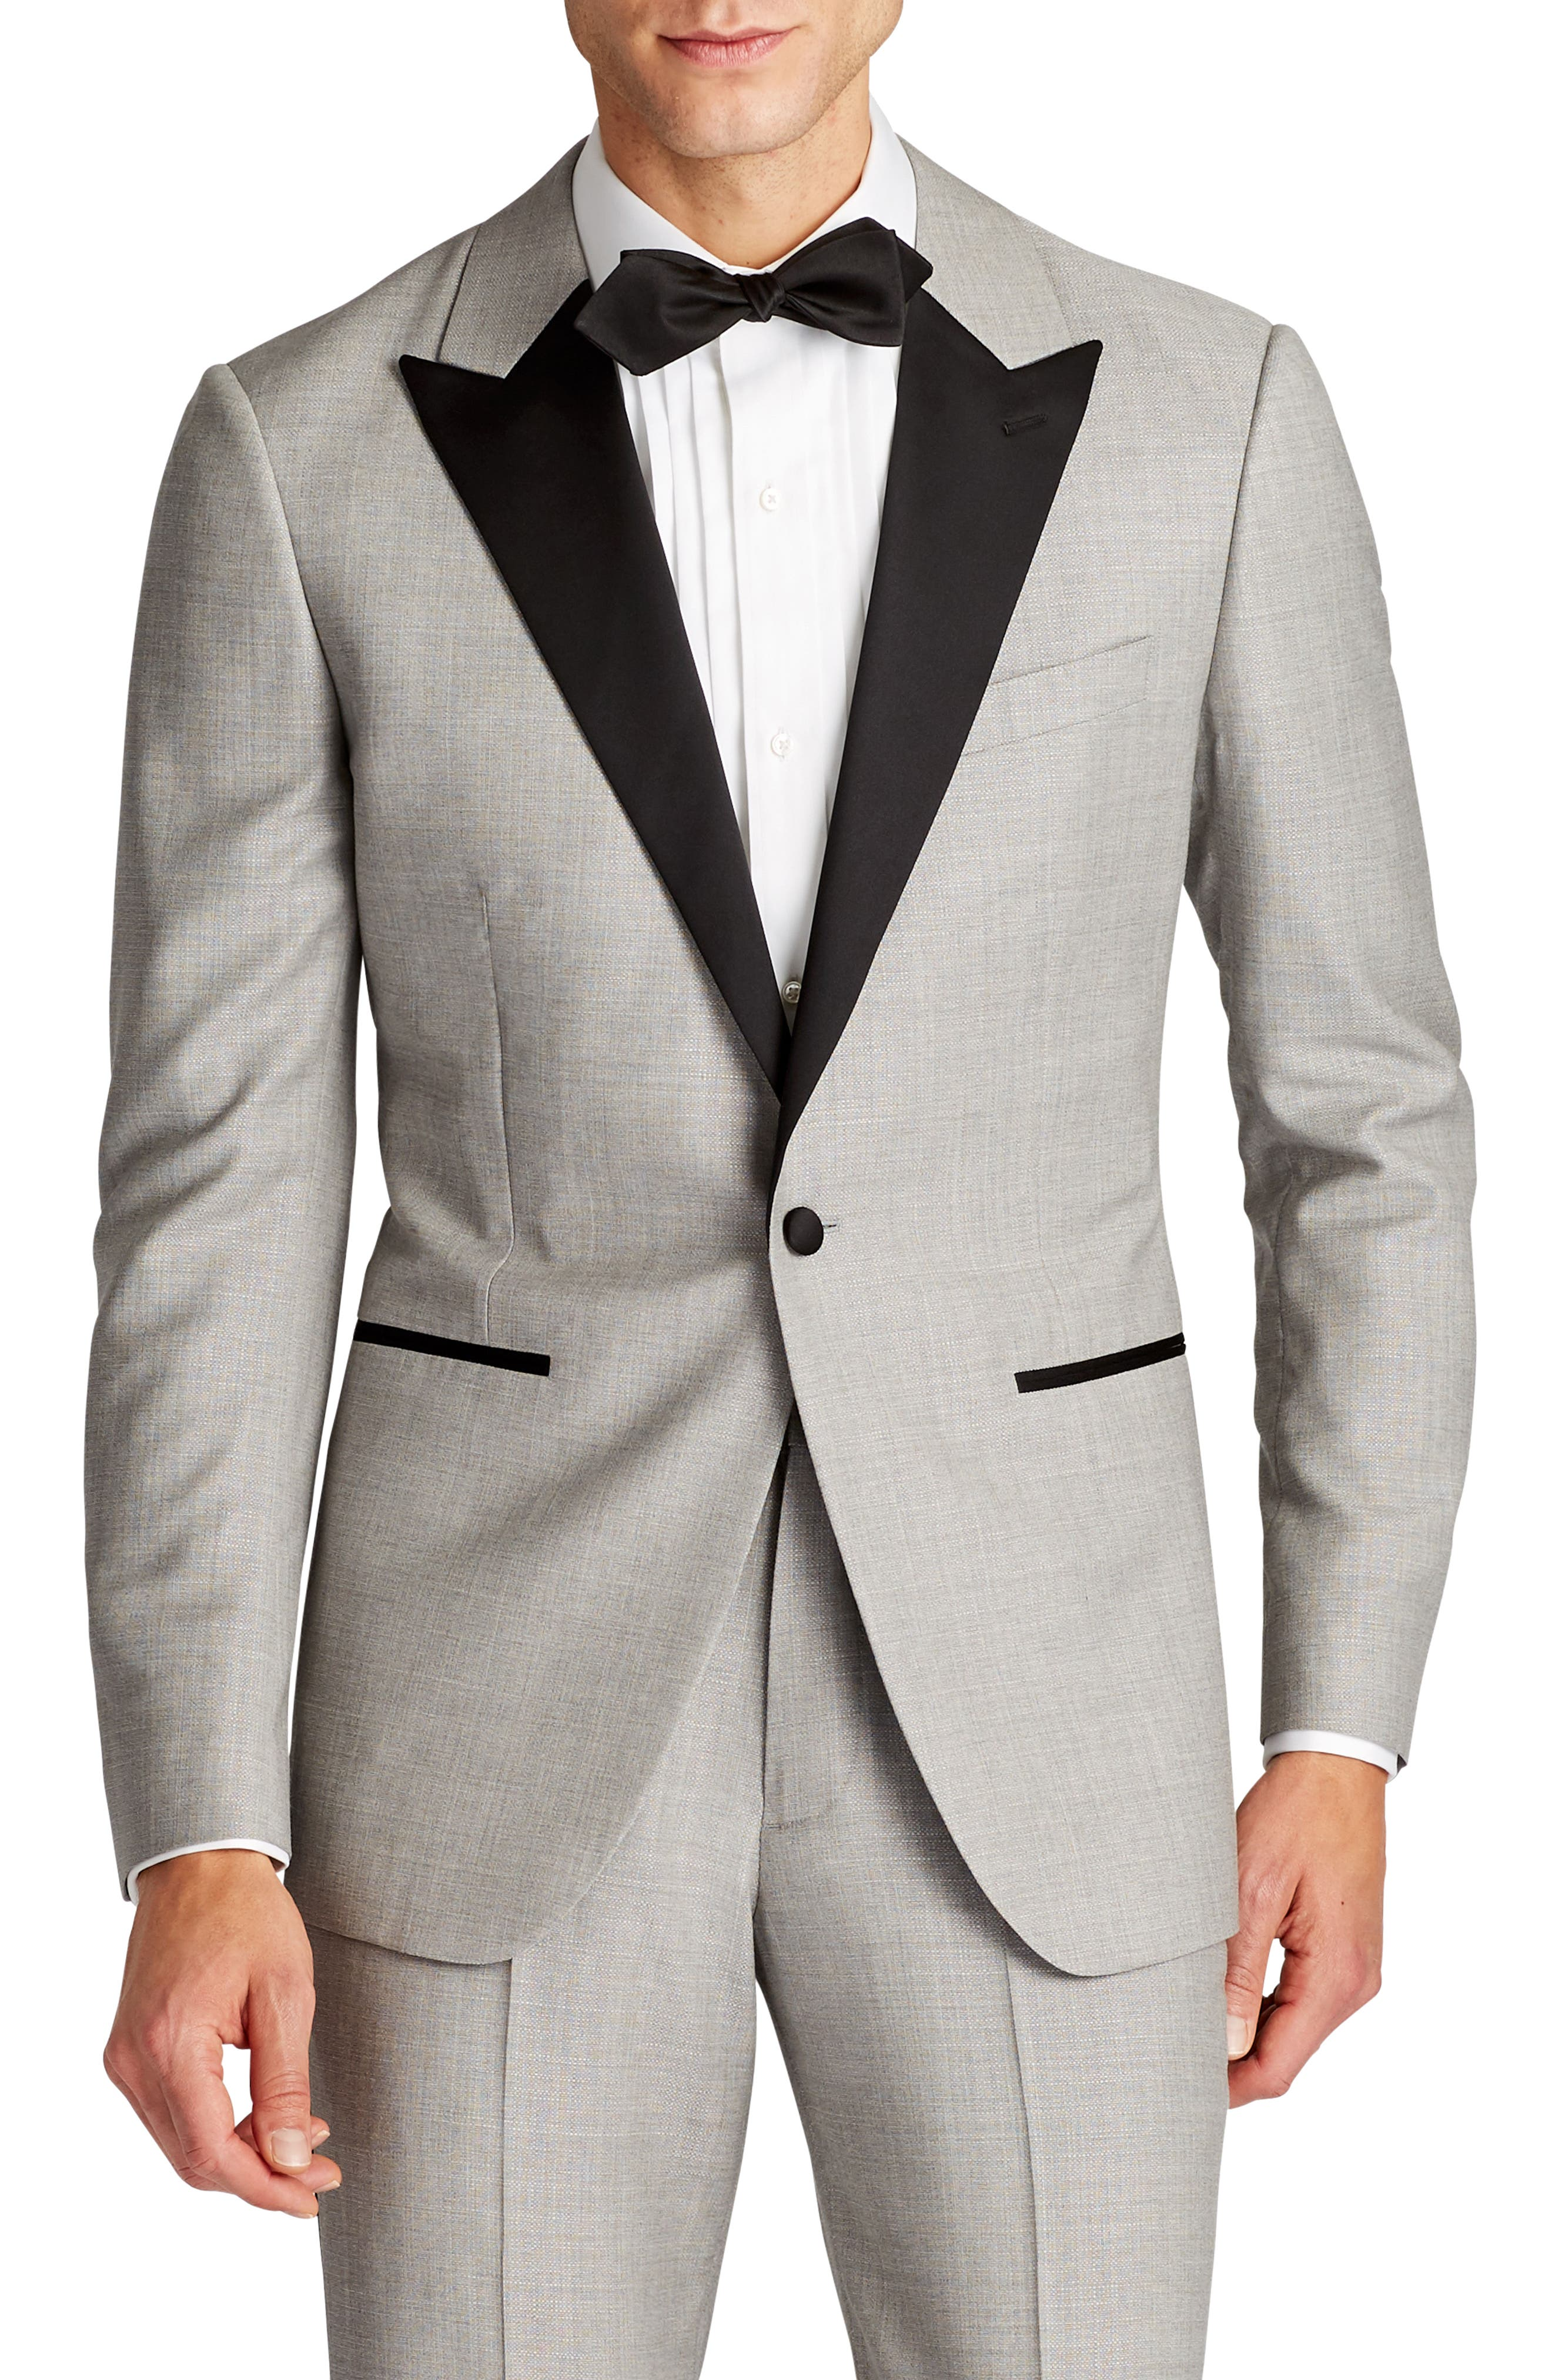 Capstone Slim Fit Wool Dinner Jacket,                             Main thumbnail 1, color,                             020